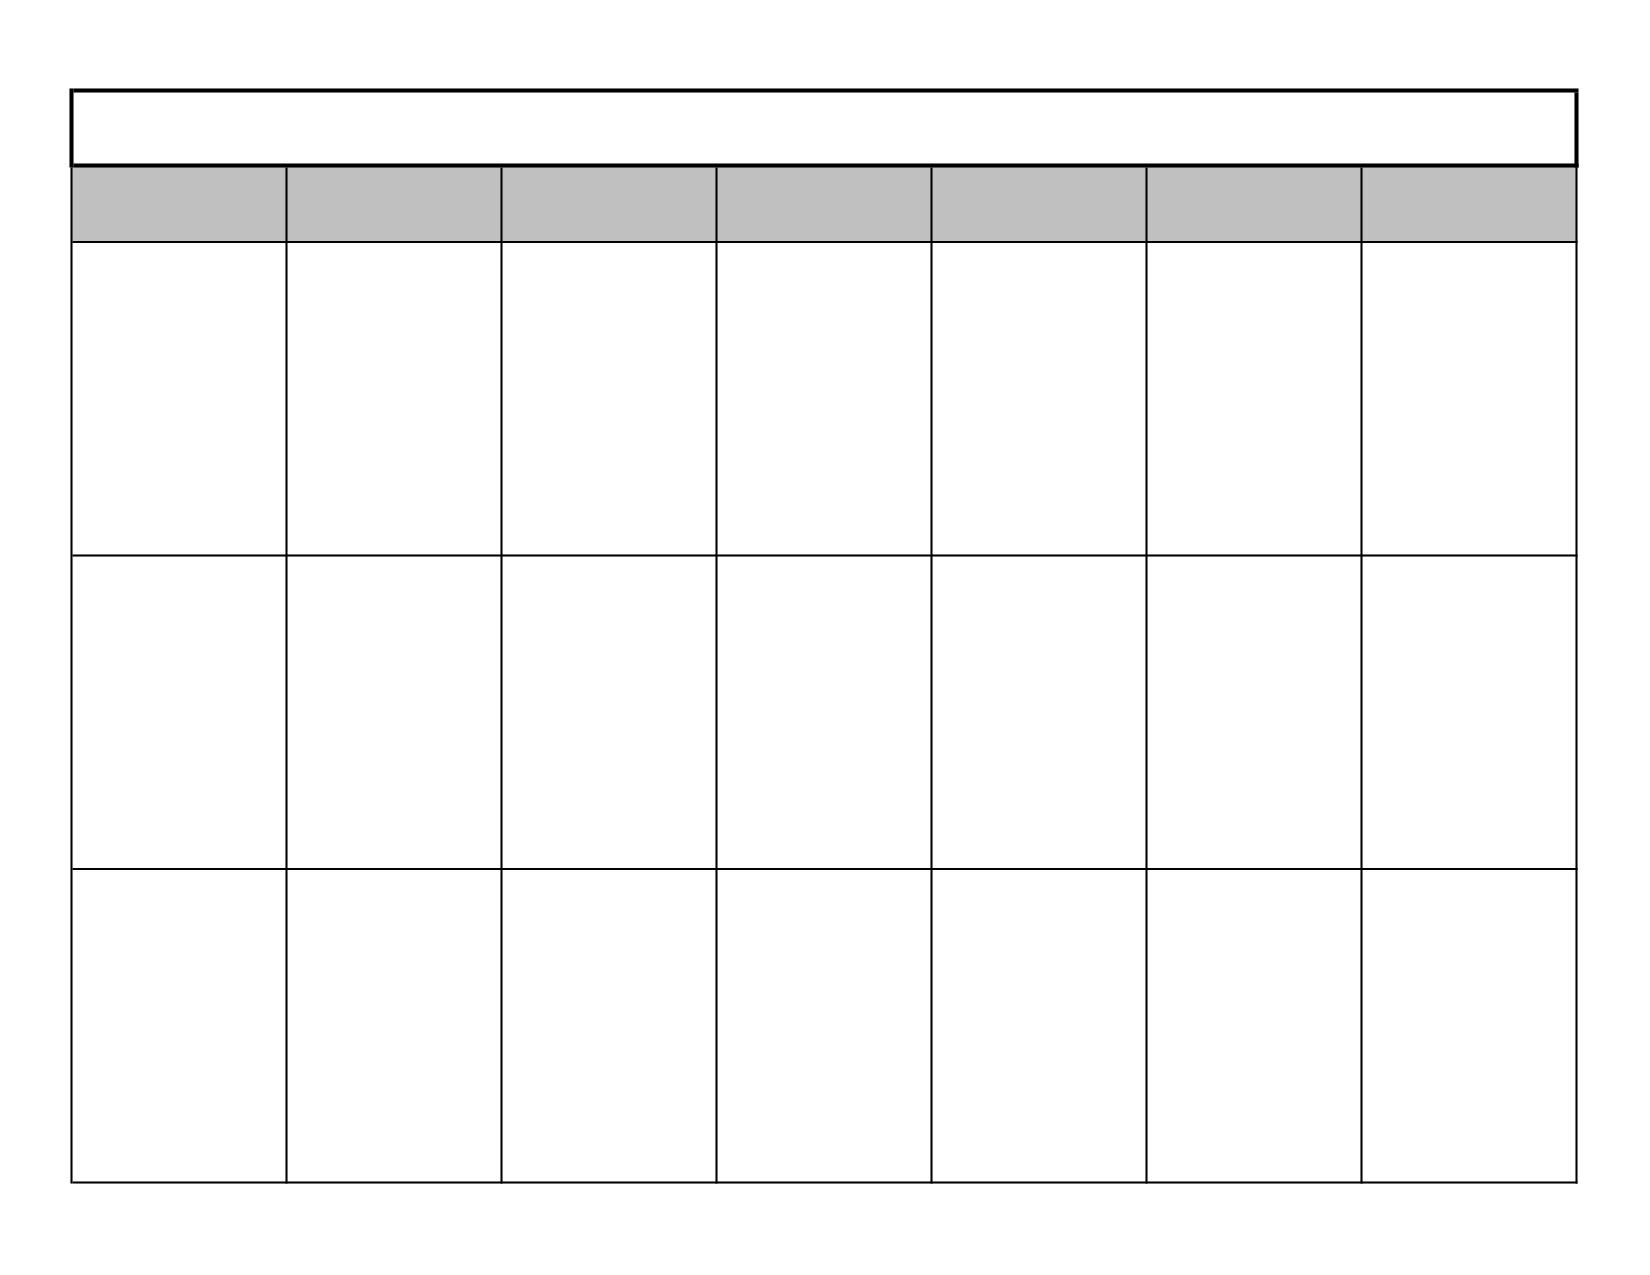 2 Week Blank Calendar Printable - Calendar Inspiration Design Blank 2 Week Schedule Template